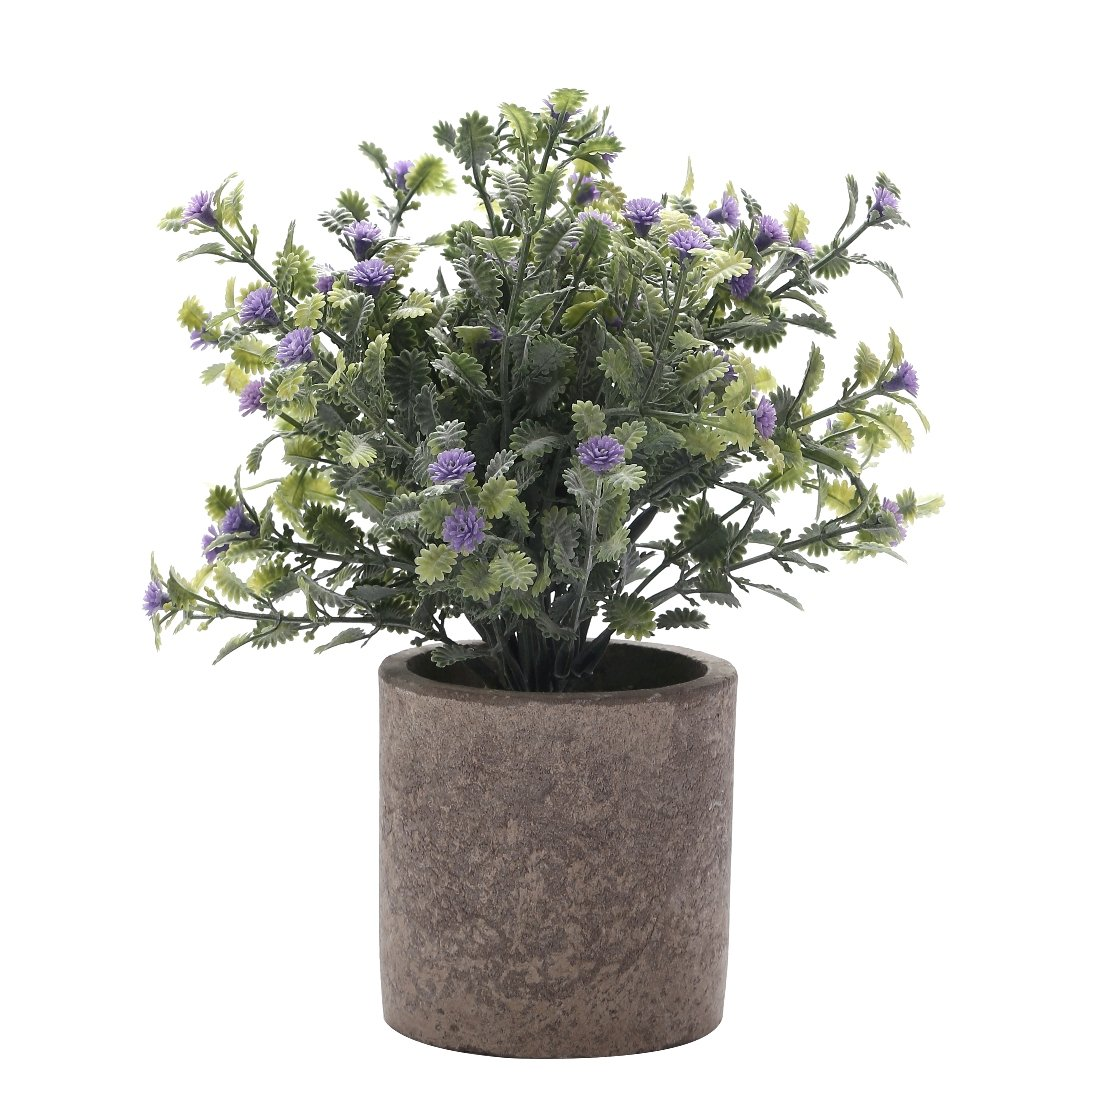 Artificial Plant Potted Mini Fake Plant Decorative Lifelike Flower Green Plants